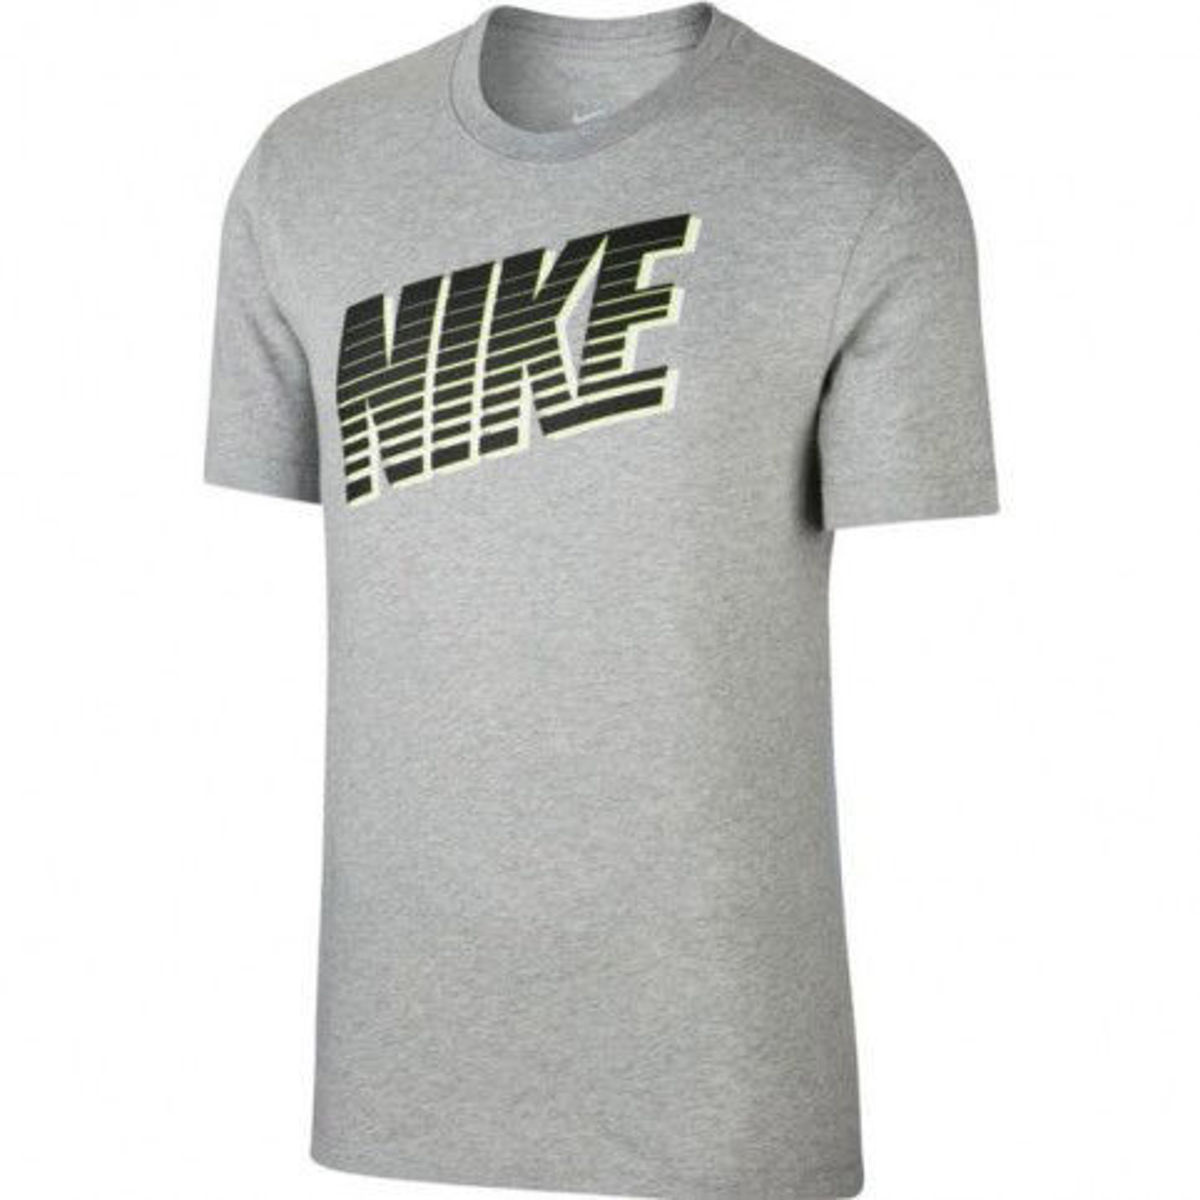 Bilde av Nike M tee Nike block CK2777-063